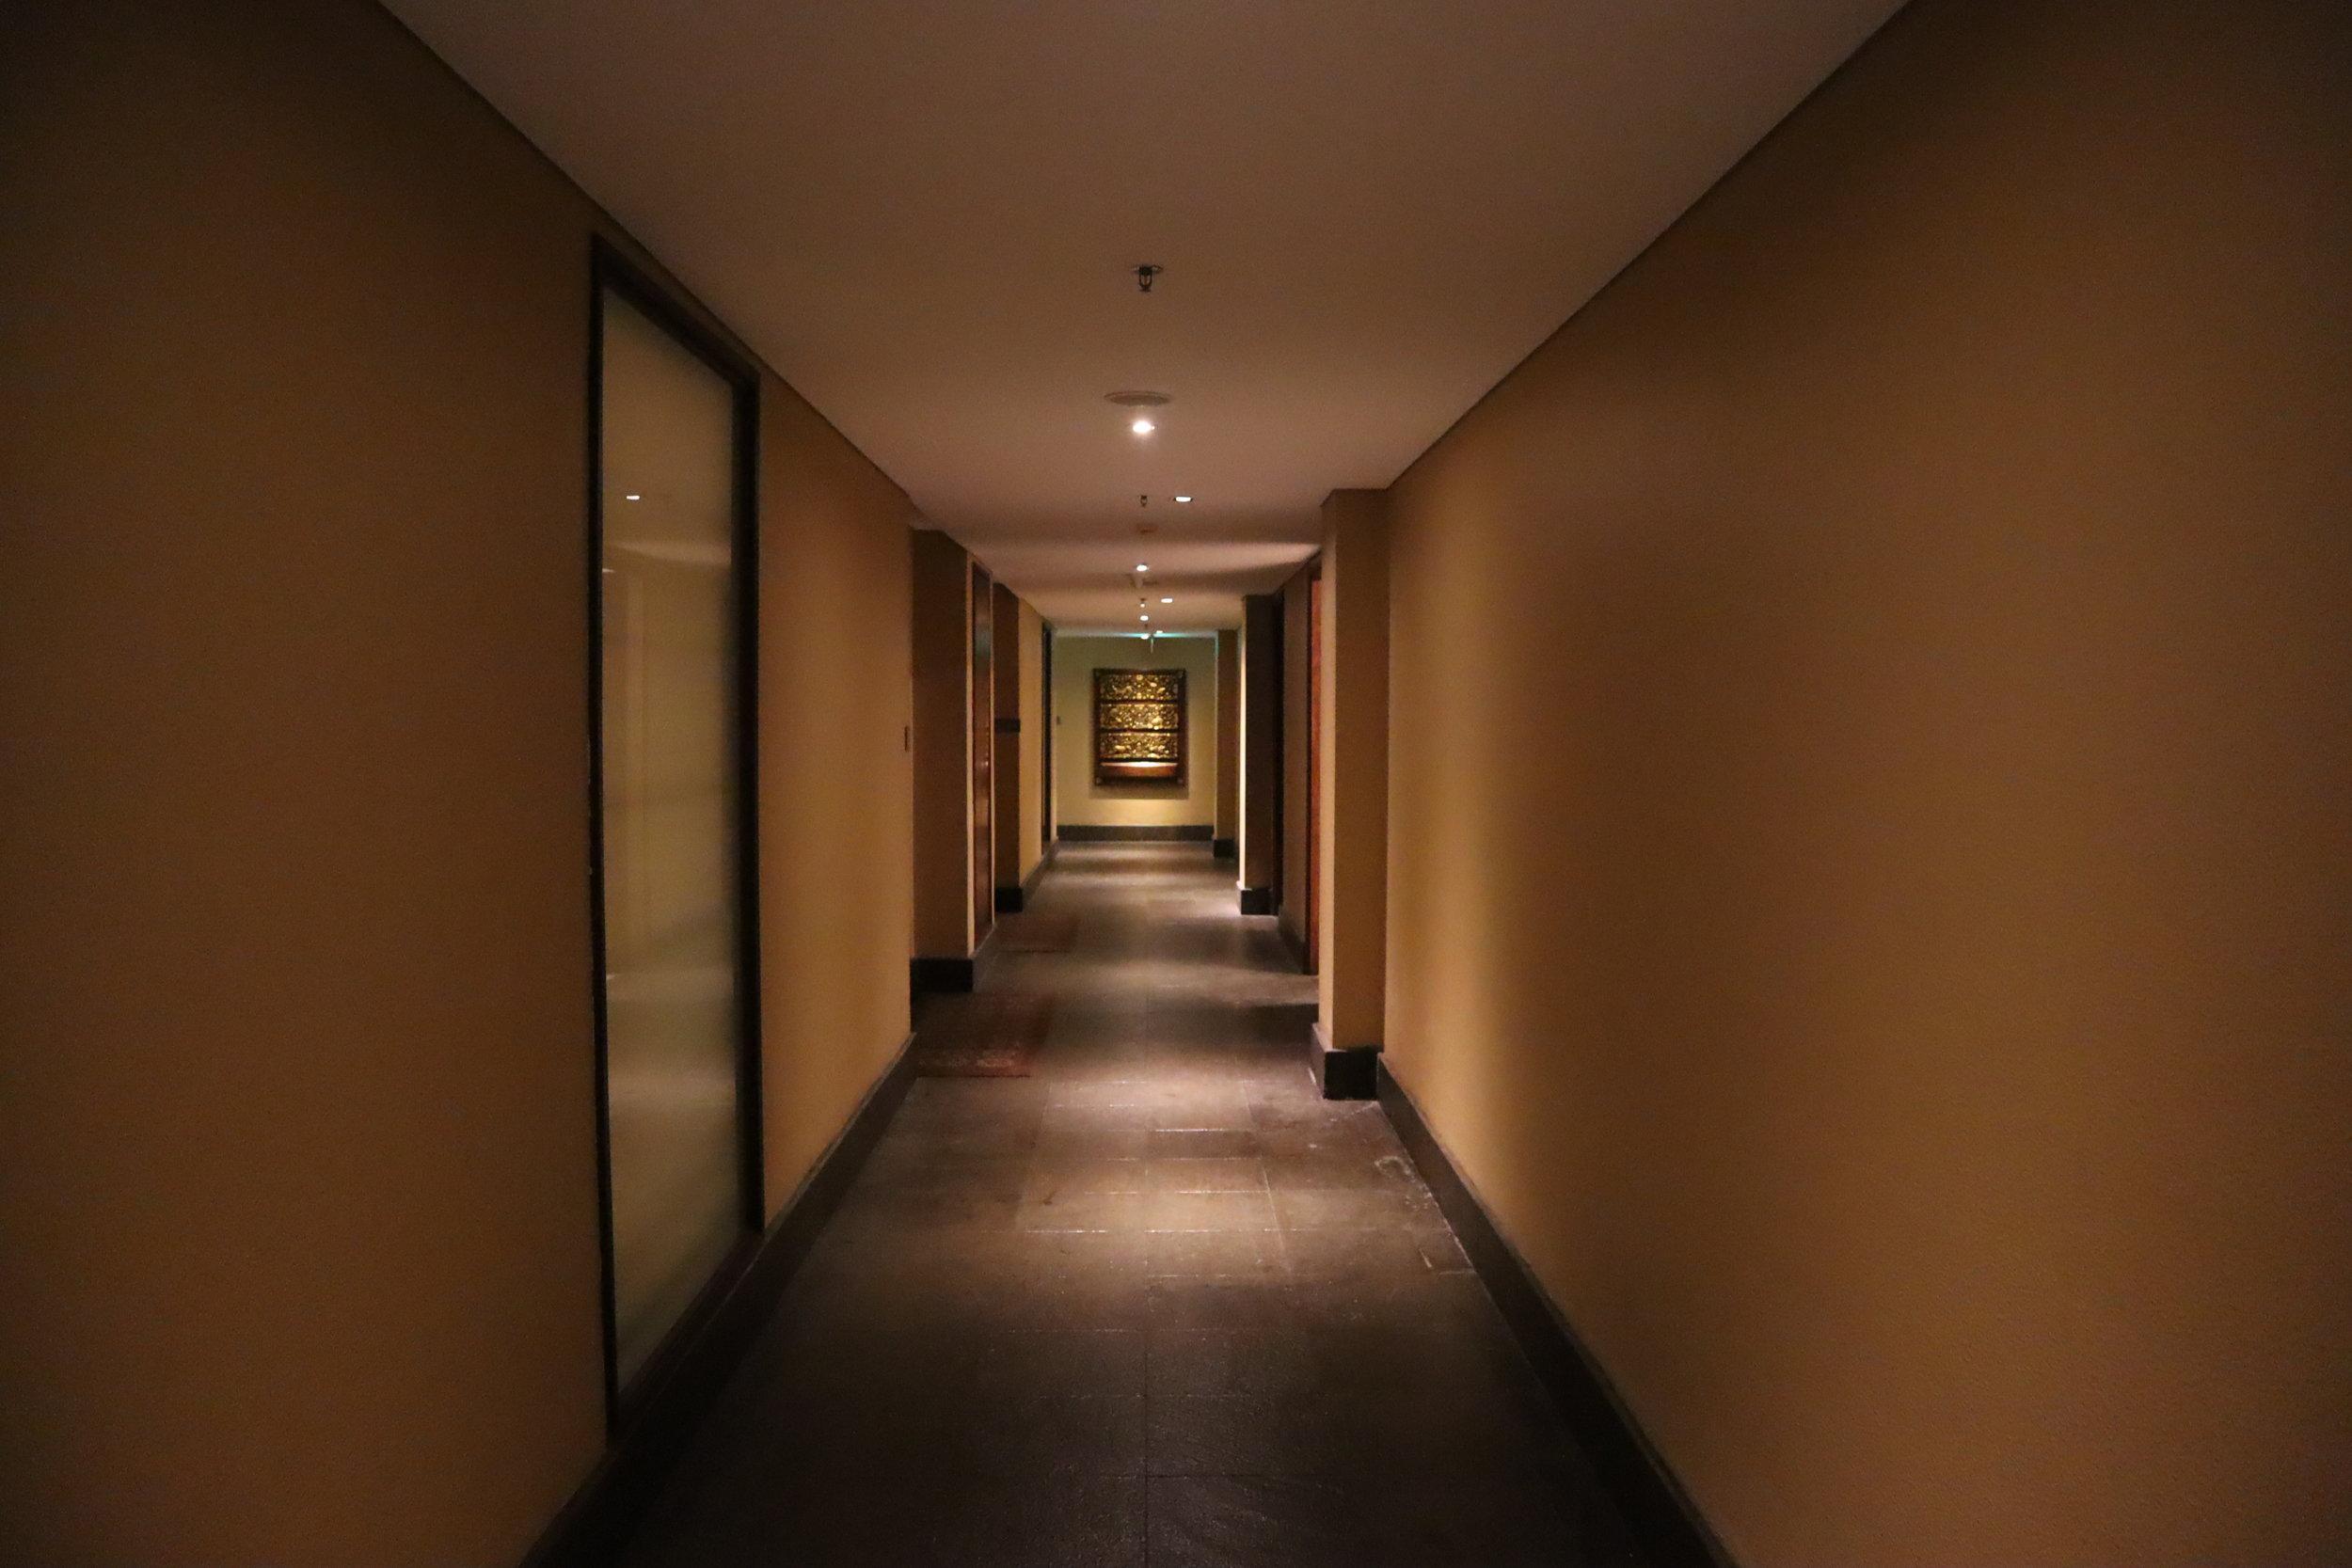 St. Regis Bali – Hallway